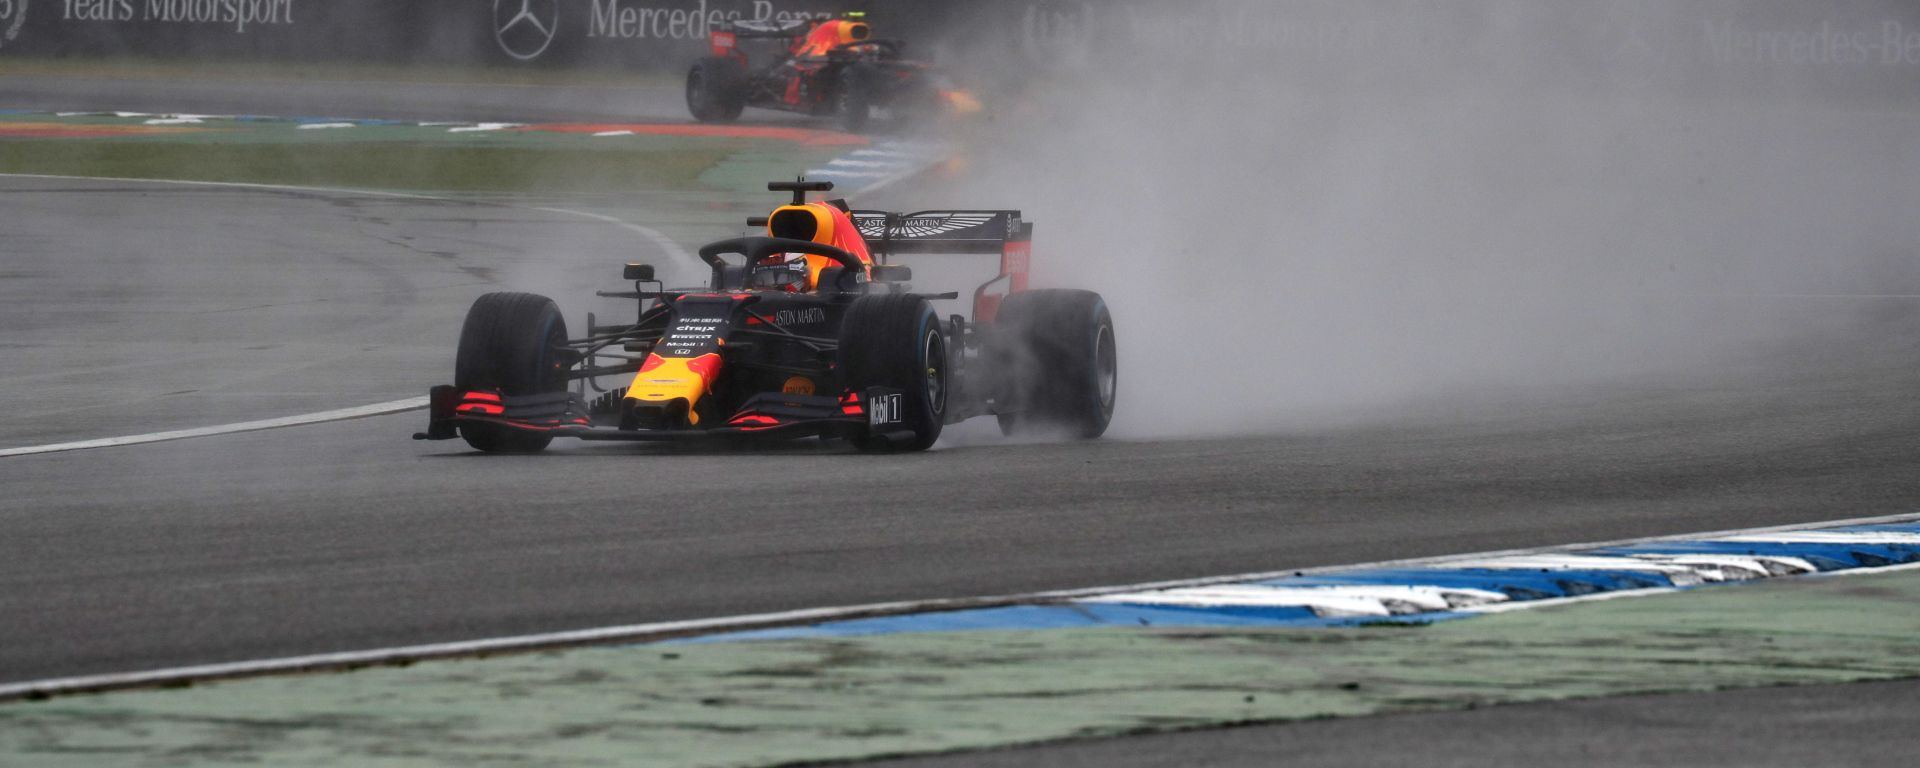 F1 GP Germania 2019, Max Verstappen (Red Bull) trionfa sul bagnato di Hockenheim